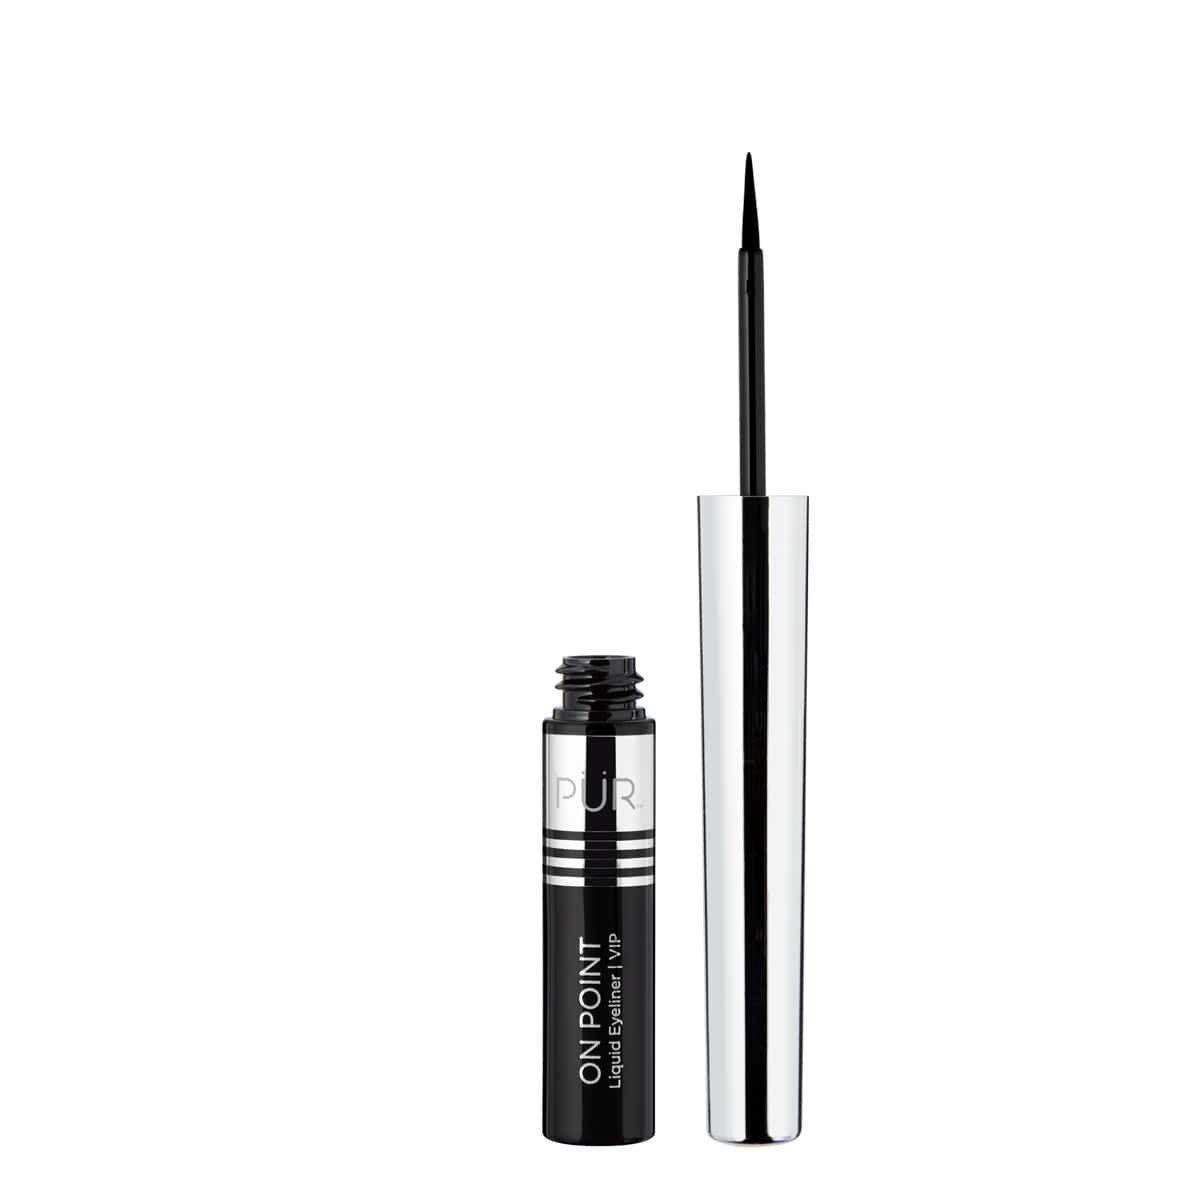 Pur Cosmetics On Point Liquid Eyeliner